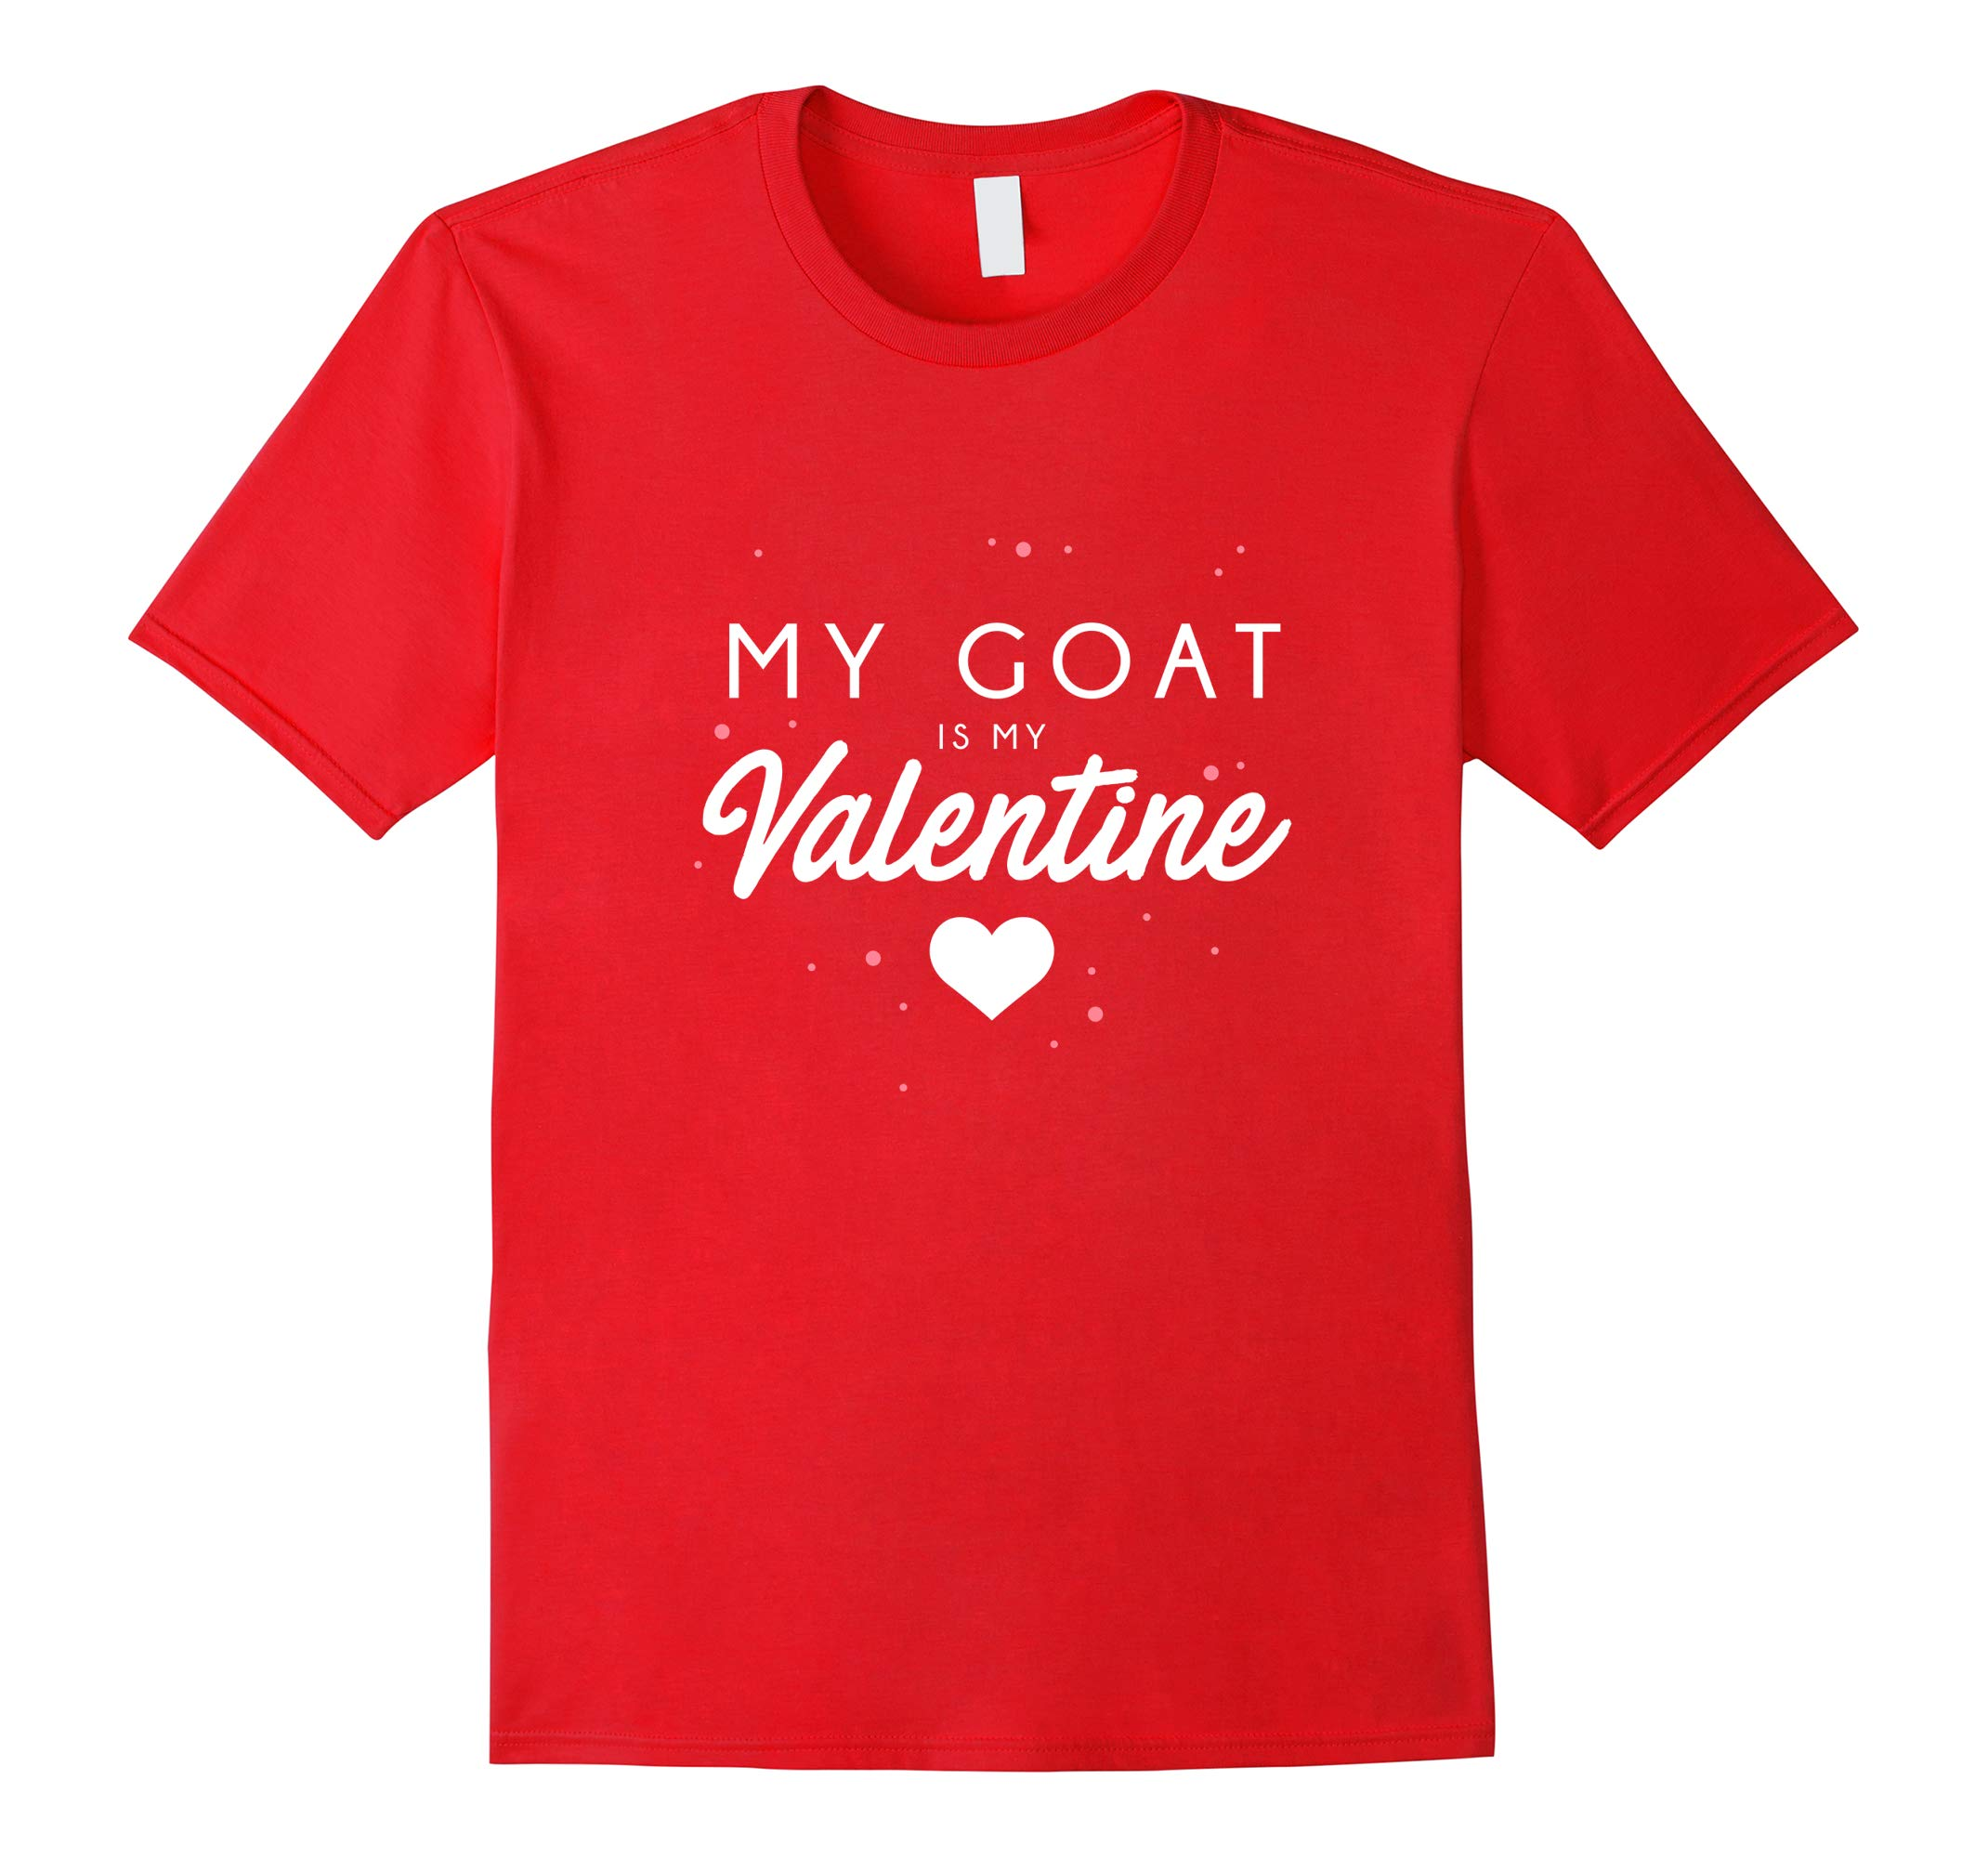 My Goat is My Valentine Shirt, Funny Valentine_s Day Gift-RT